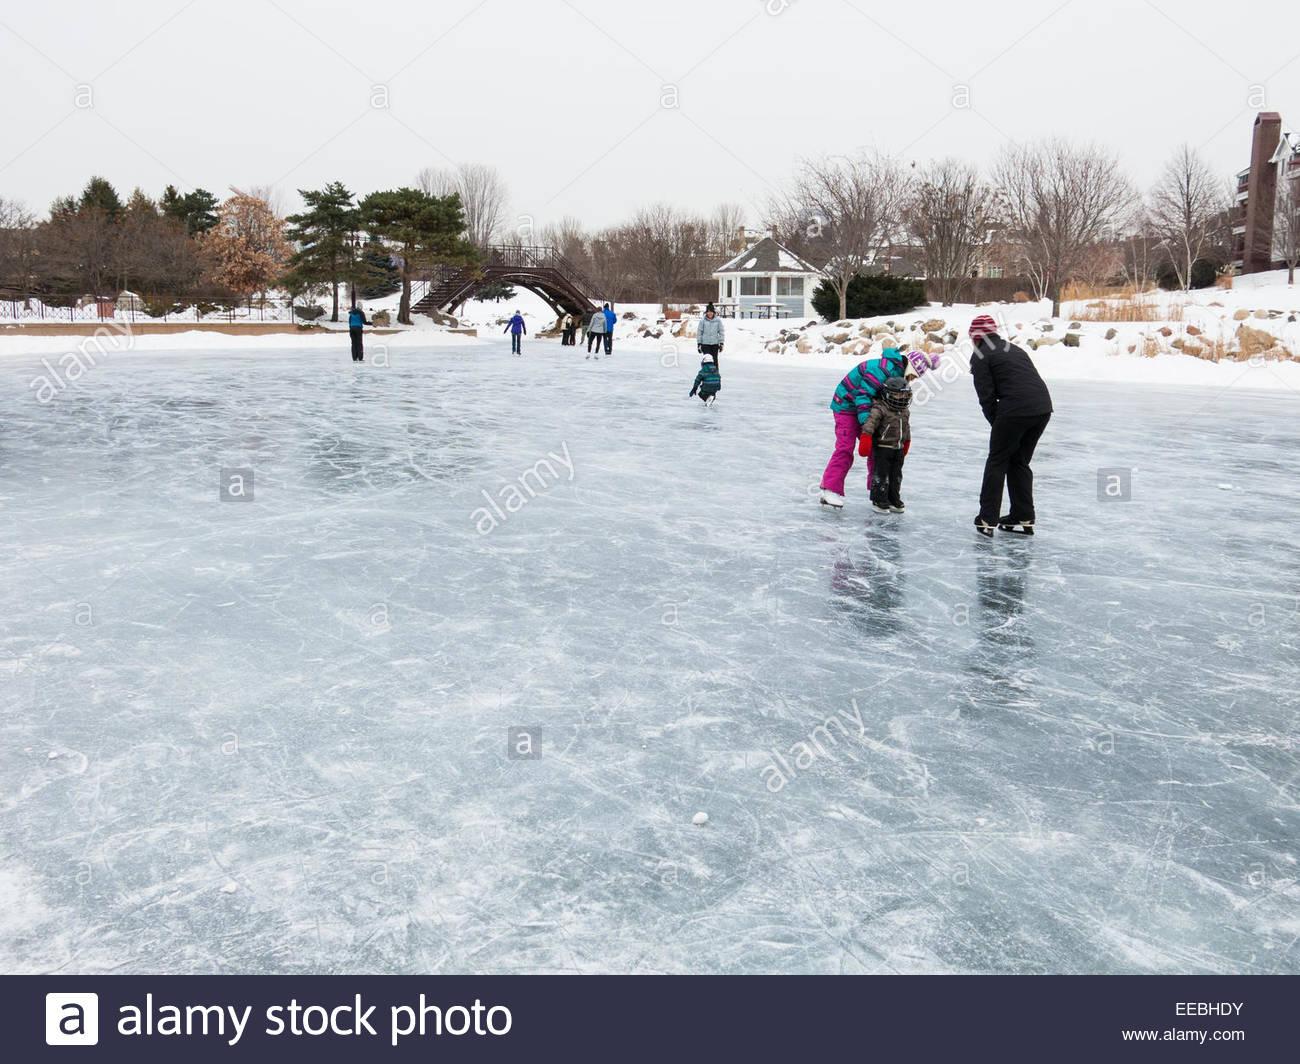 Ice skate rink on a frozen lake, Minnesota, USA - Stock Image